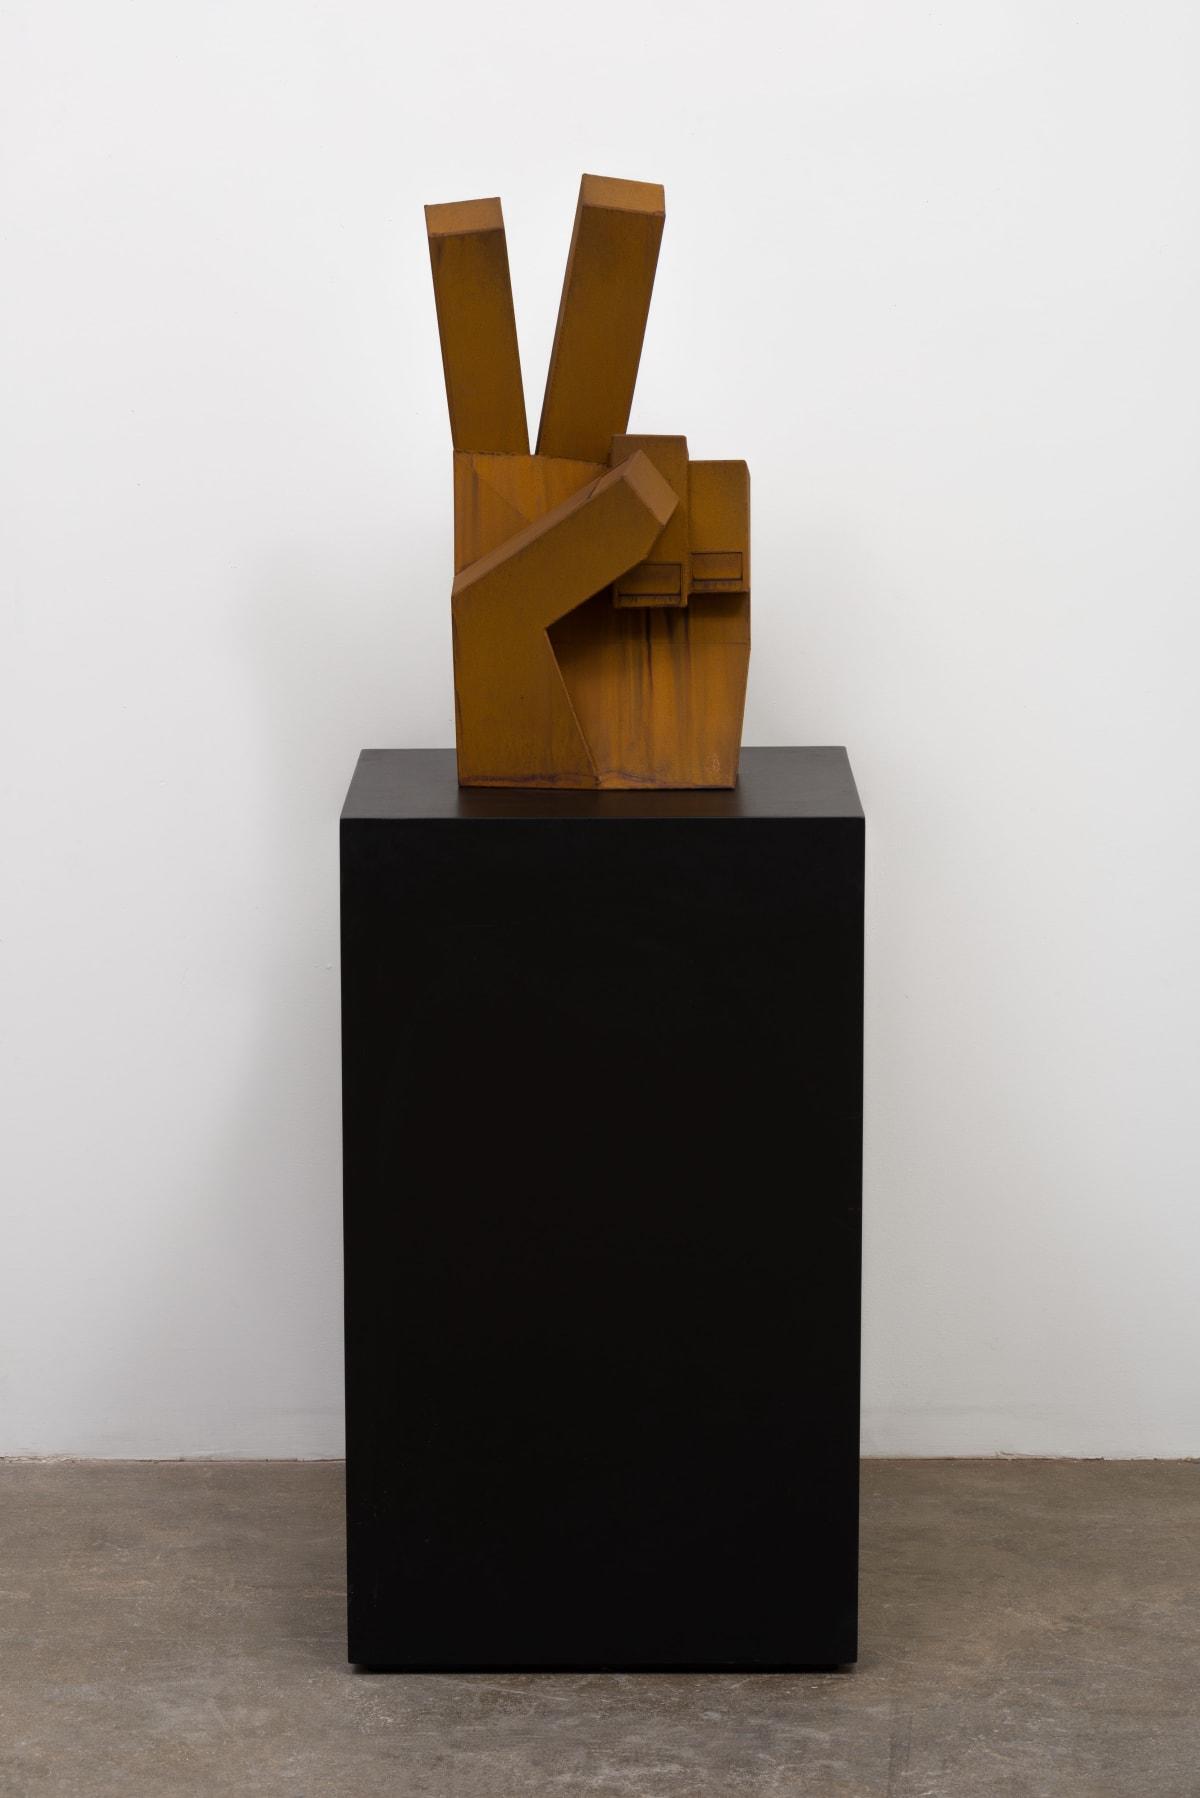 Nathan Mabry, Heavy Handed (Symbol), 2018